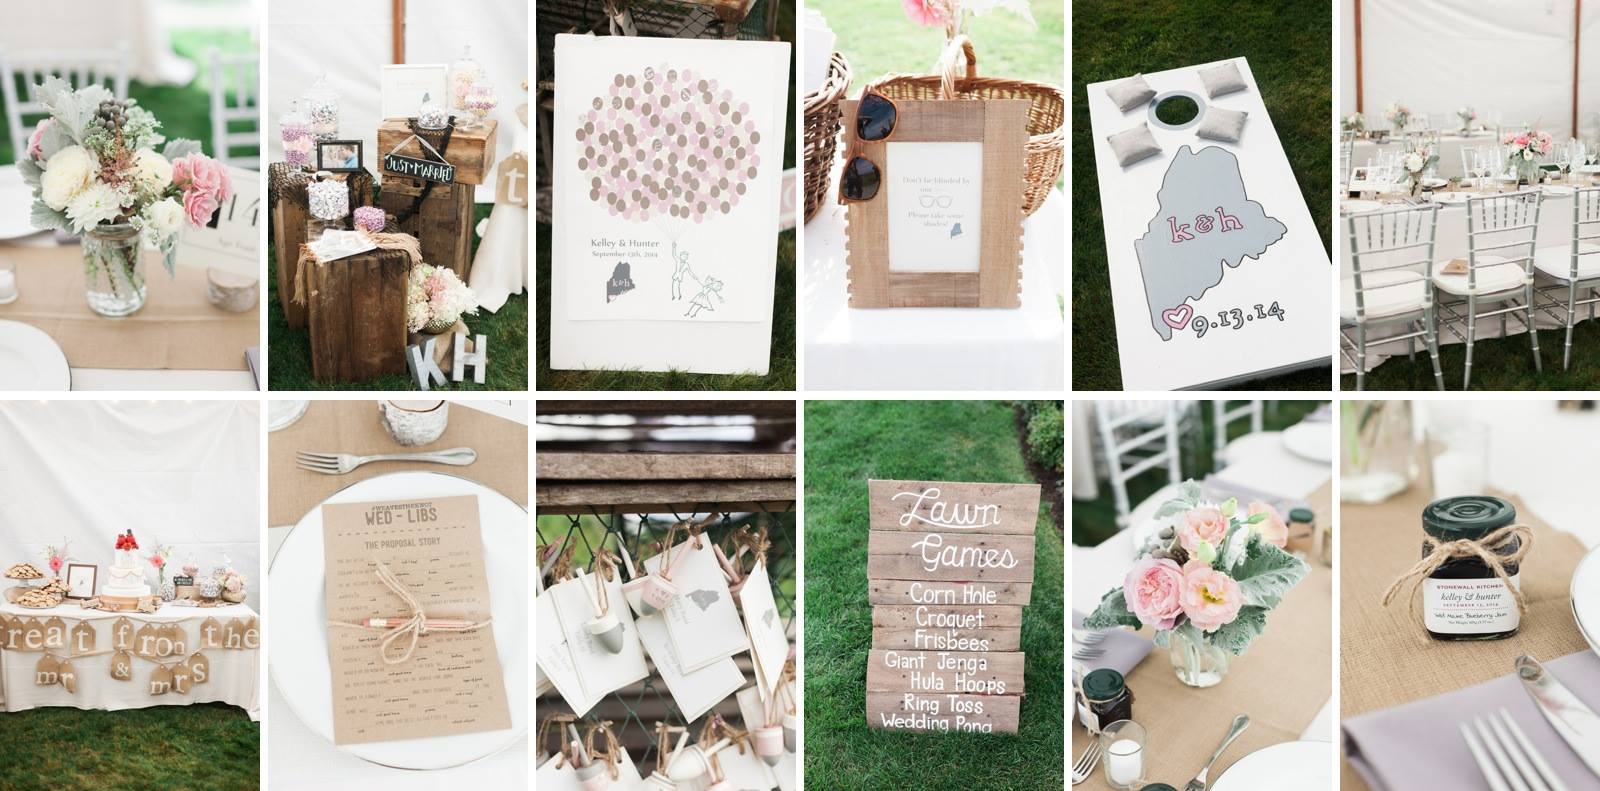 Wedding invitations, wedding decor, kennebunkport events